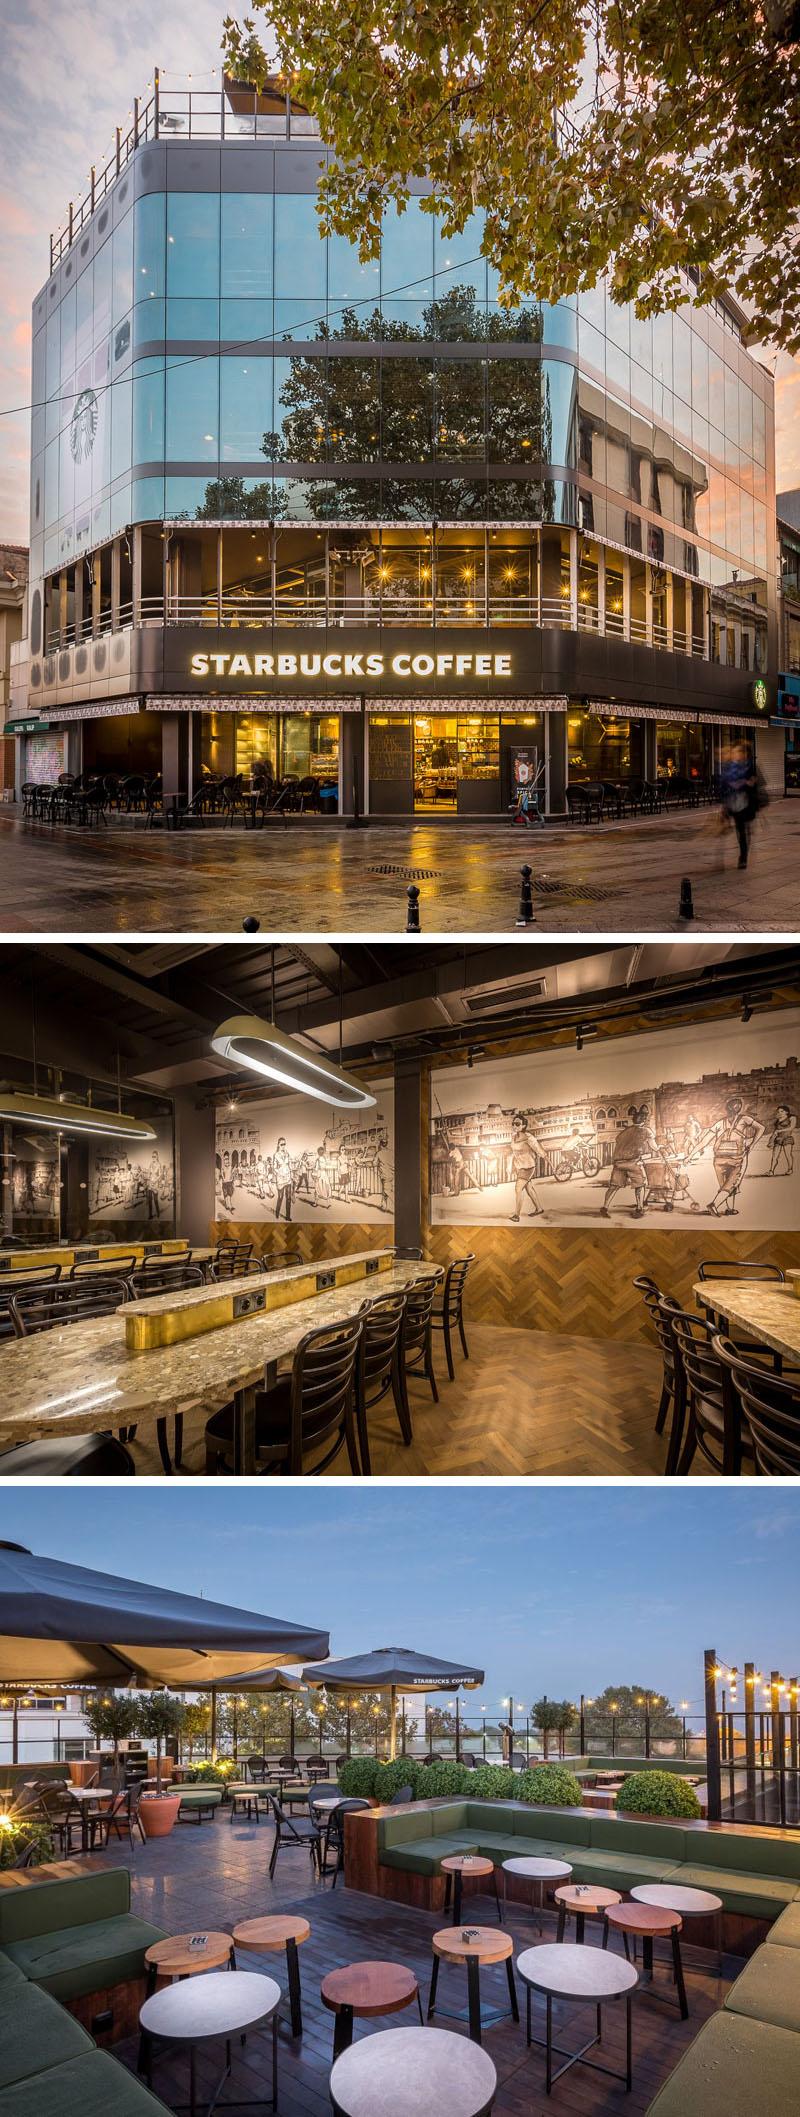 polityka randkowa Starbucks speed dating leipzig erfahrung